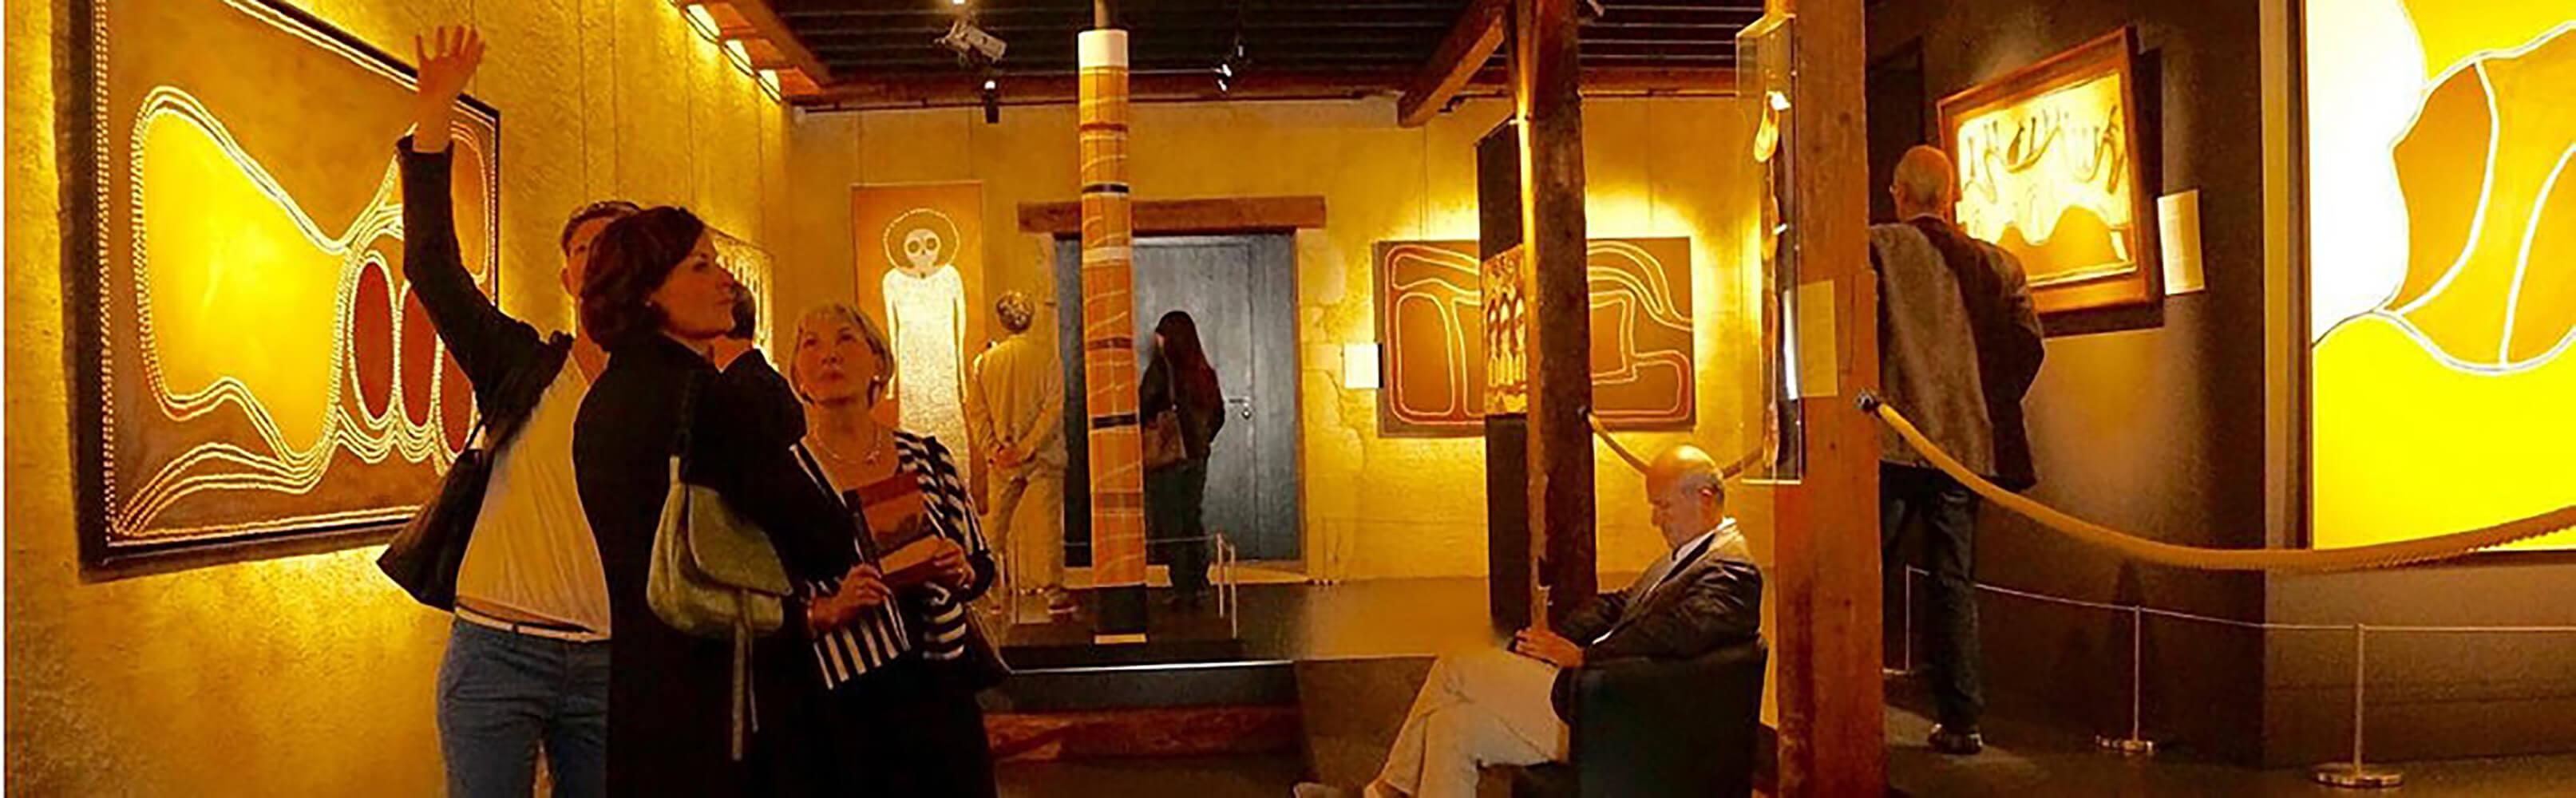 Musée d'art aborigène australien La grange Môtiers 1